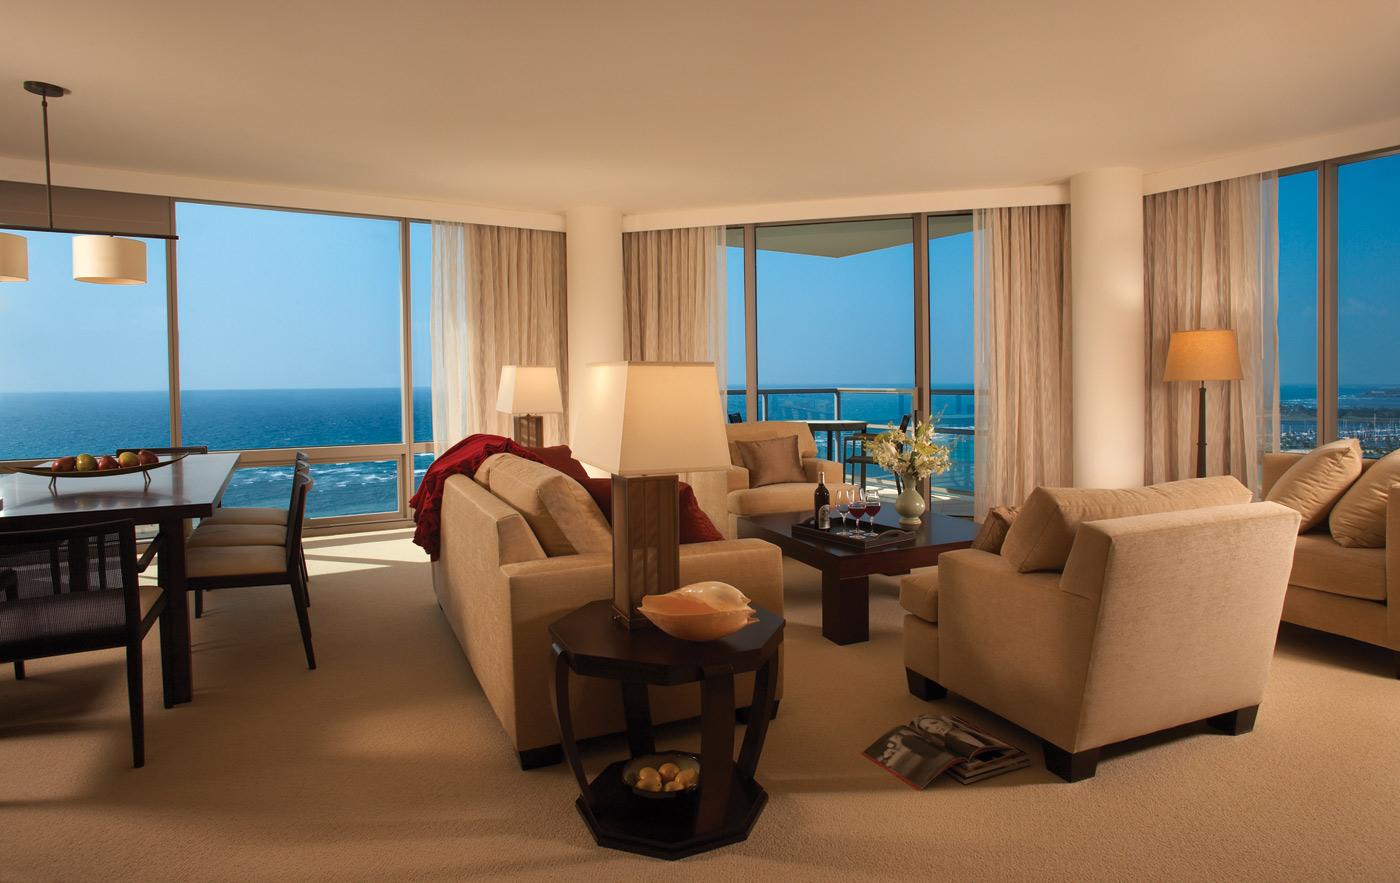 Trump international hotel waikiki beach walk honolulu hawaii - 2 bedroom suites in honolulu hawaii ...